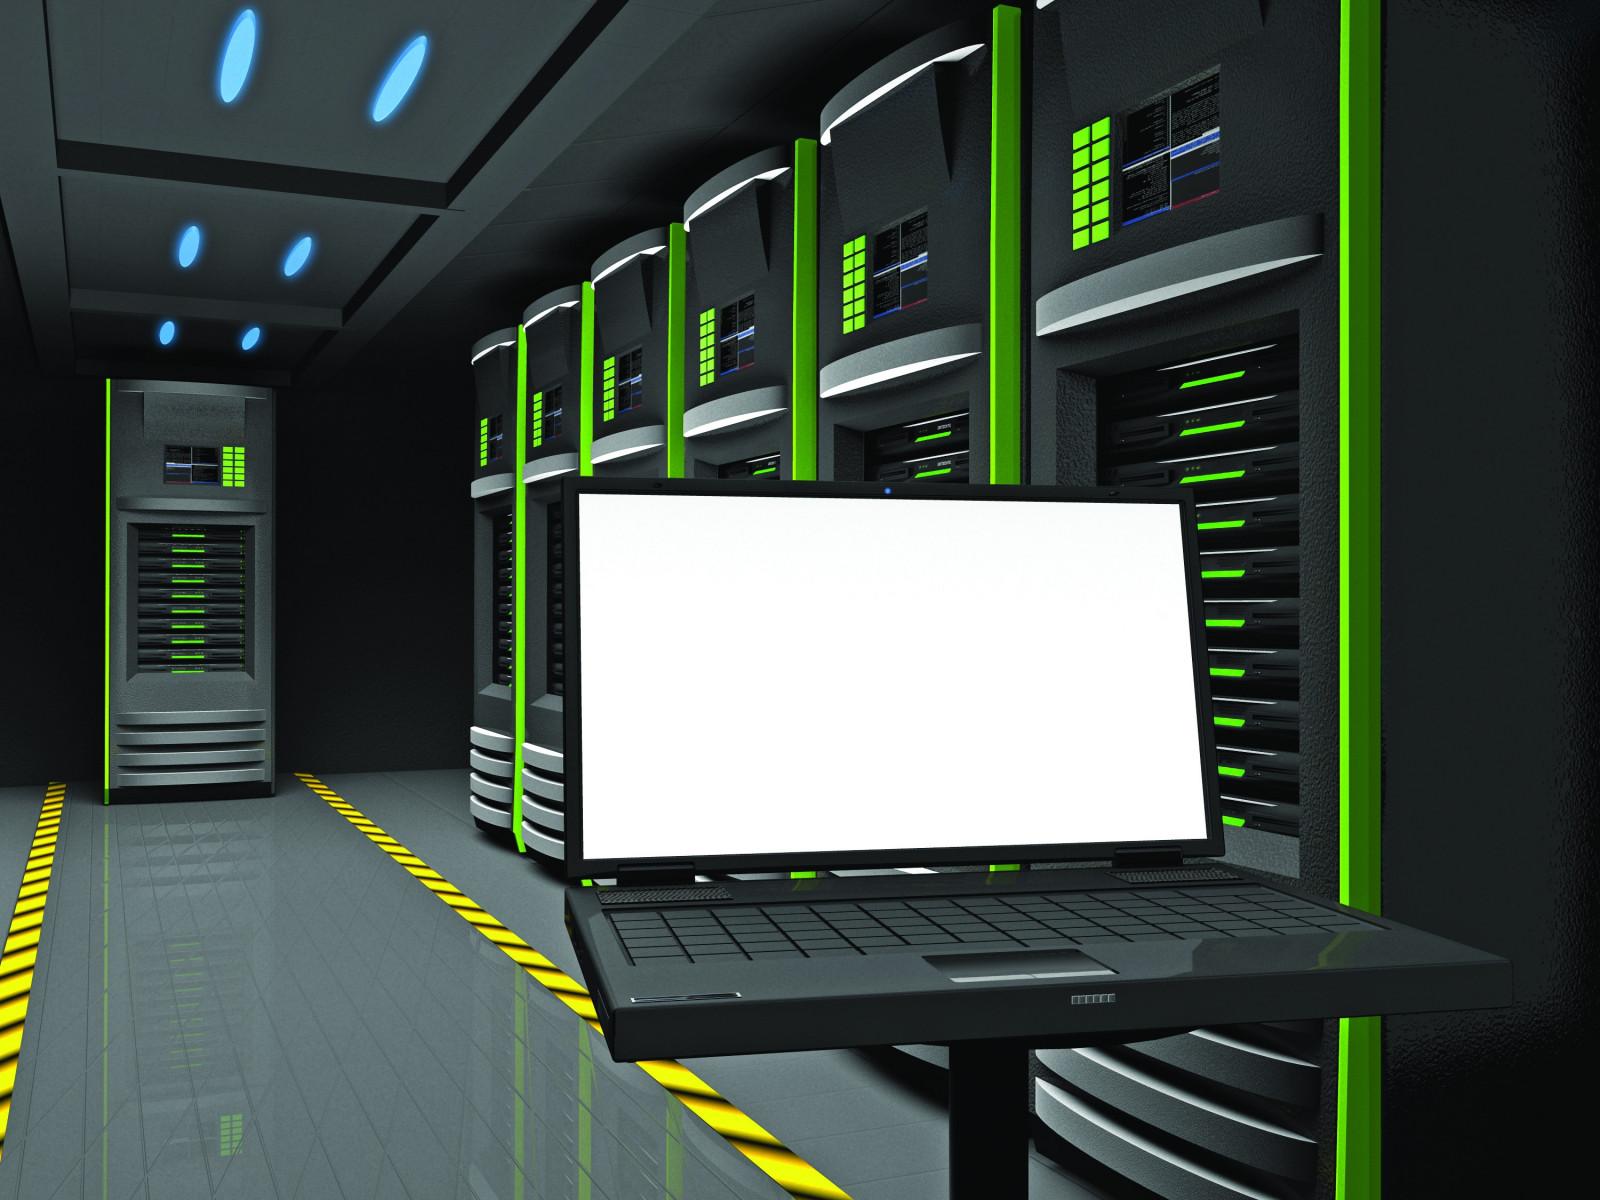 Wallpaper : Laptop, Management, Server, Administration, 3d